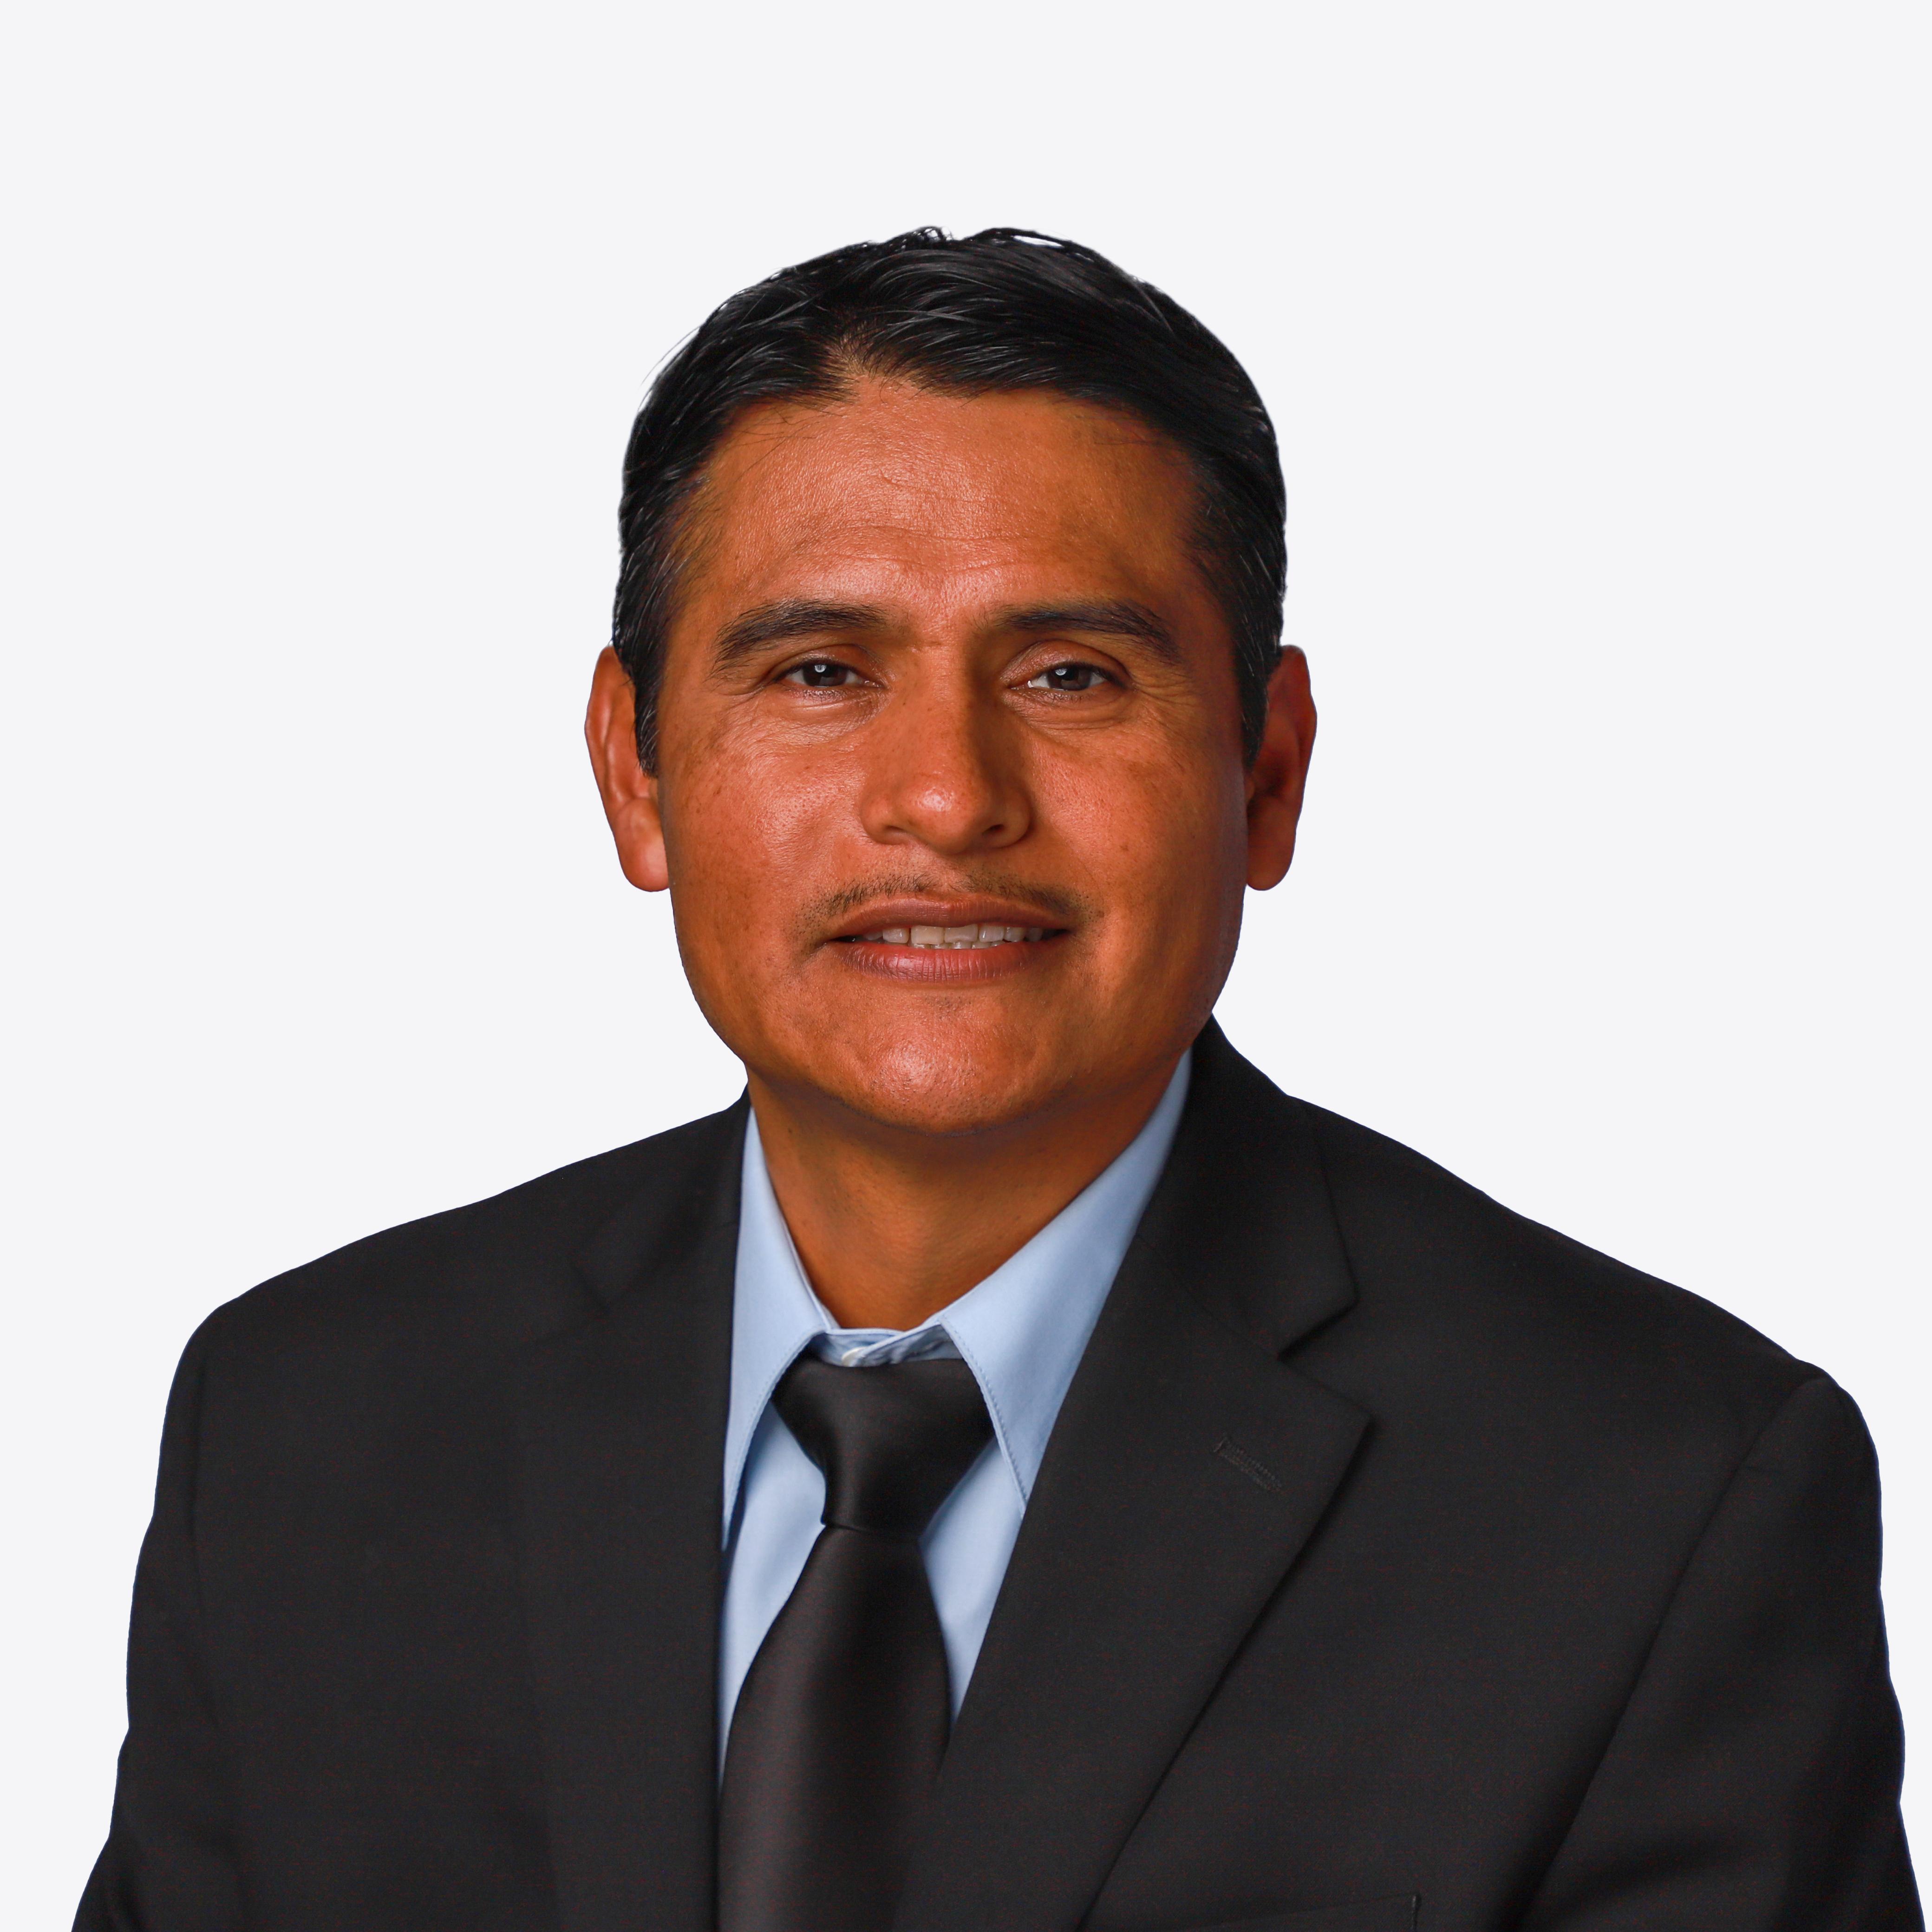 Arturo Renteria